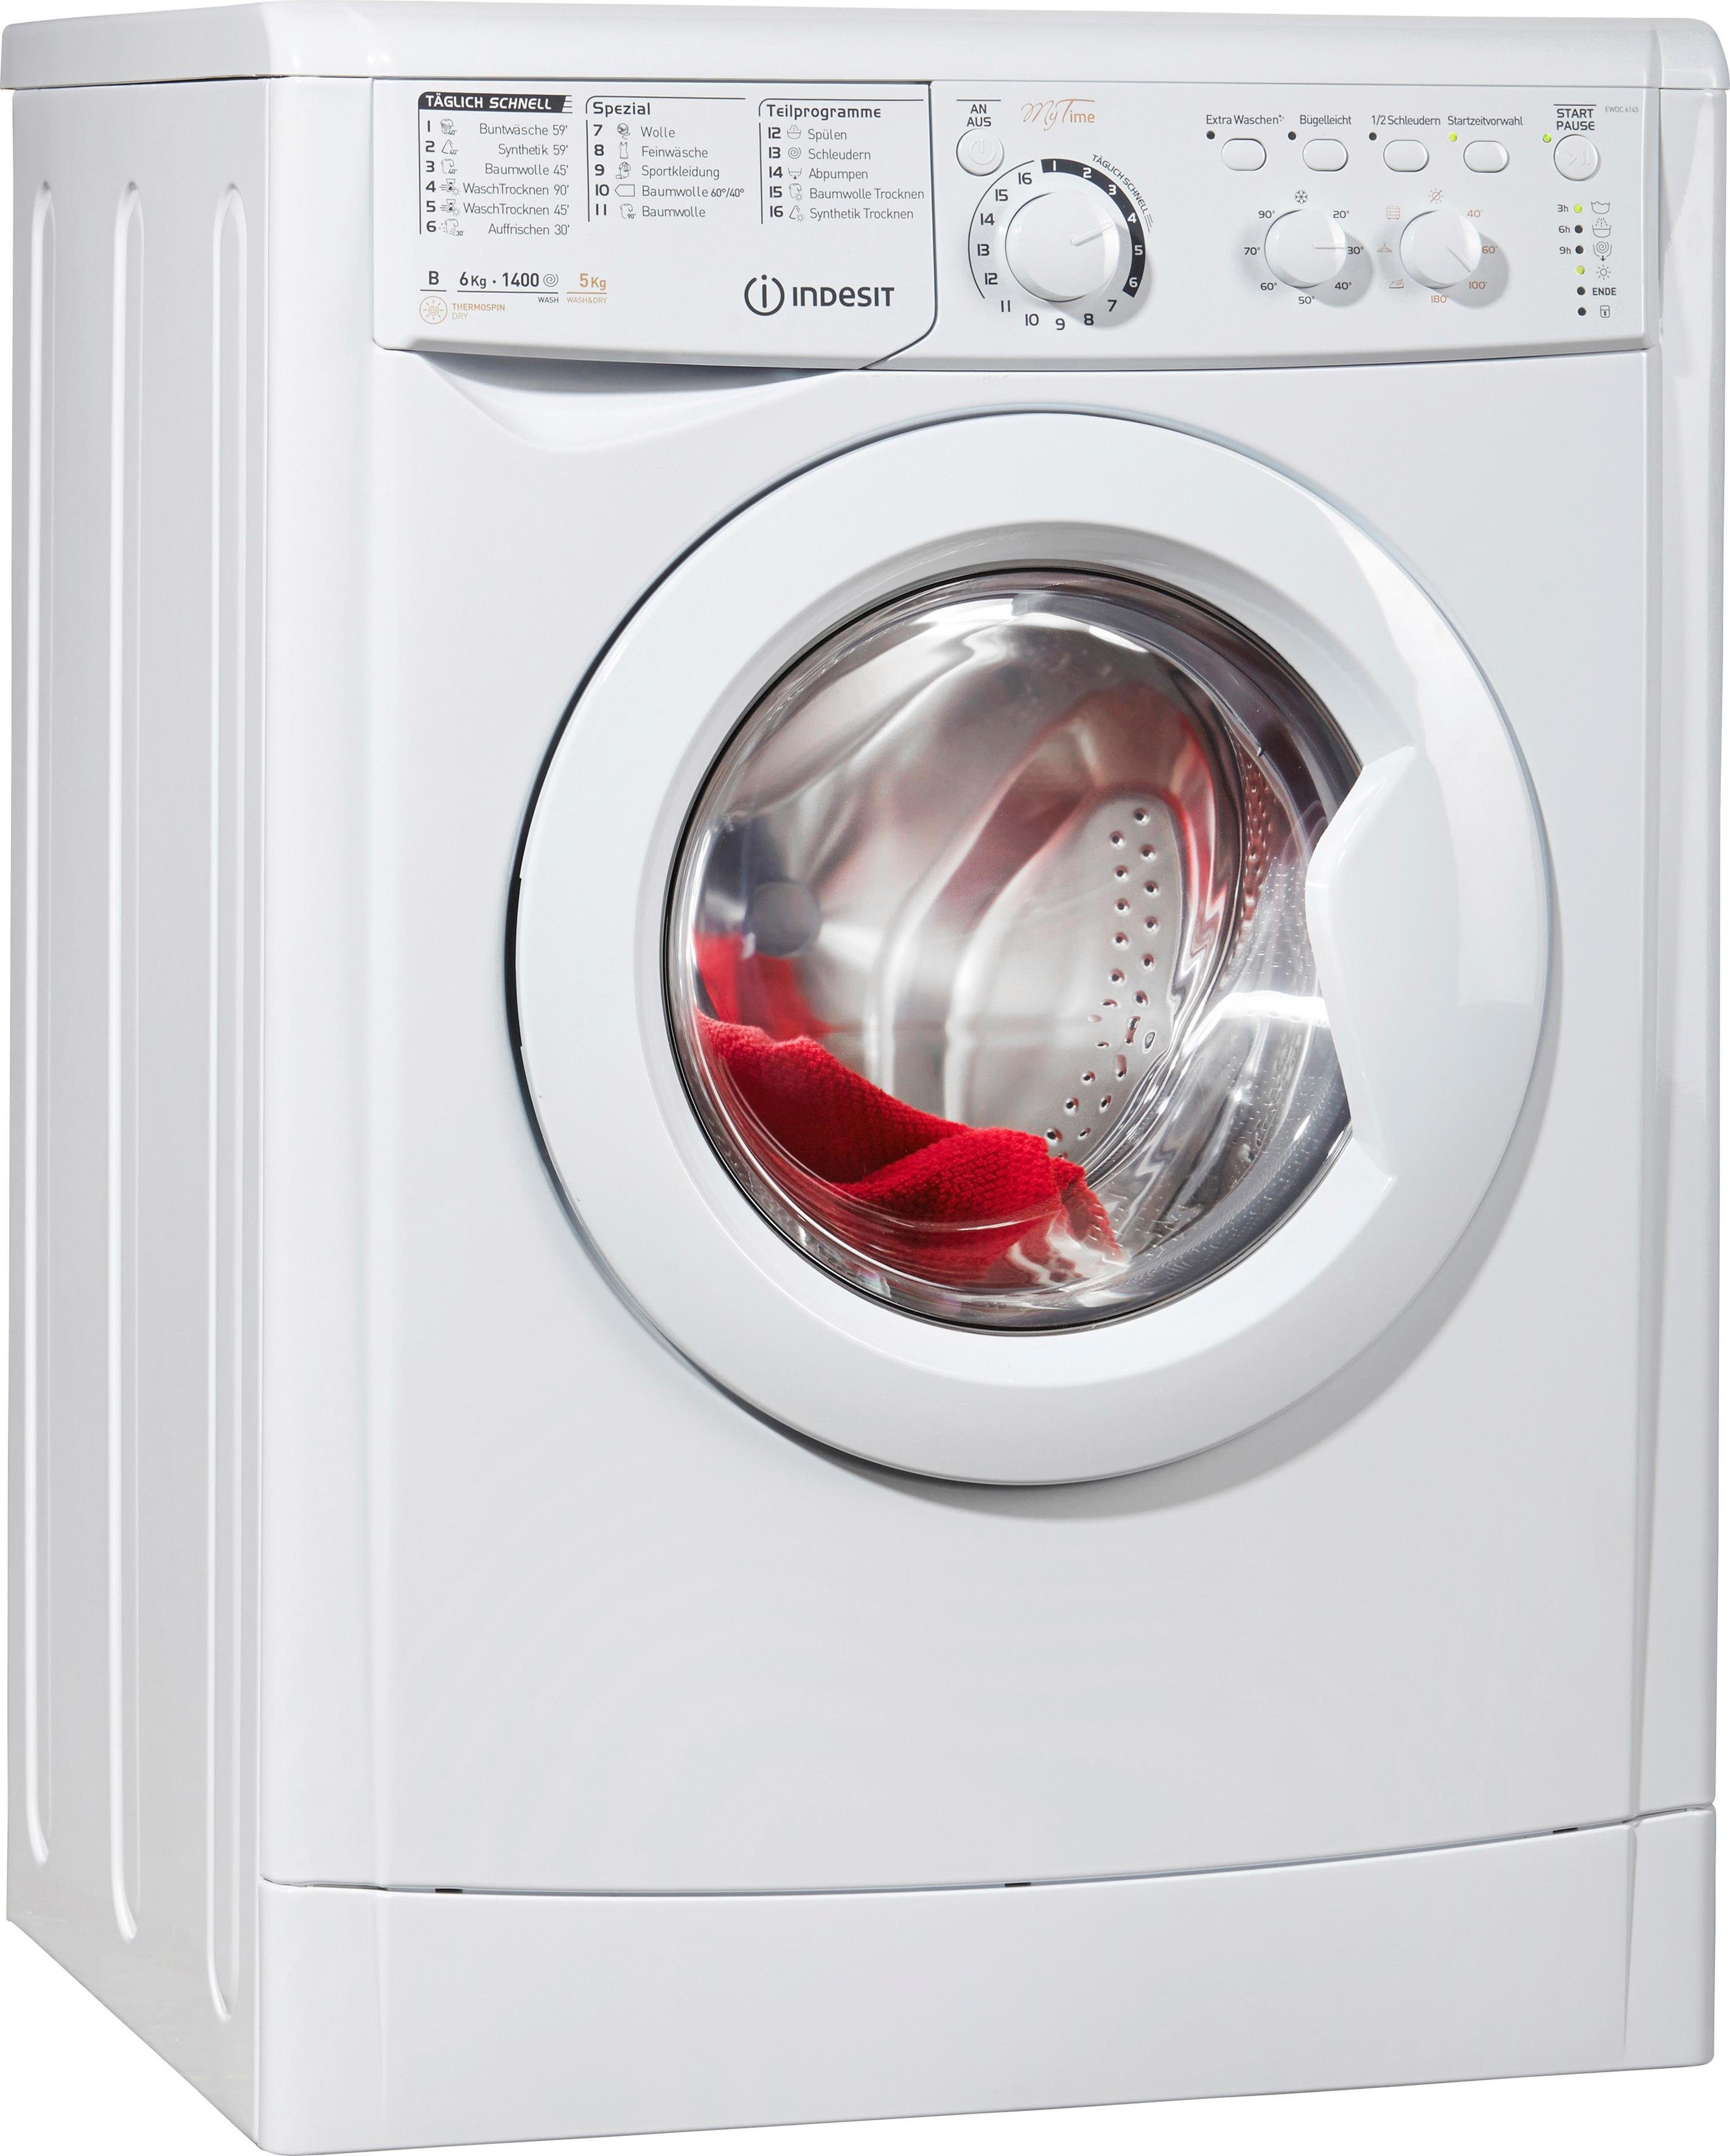 Indesit Waschtrockner EWDC 6145 W DE, B, 6 kg / 5 kg, 1.400 U/Min